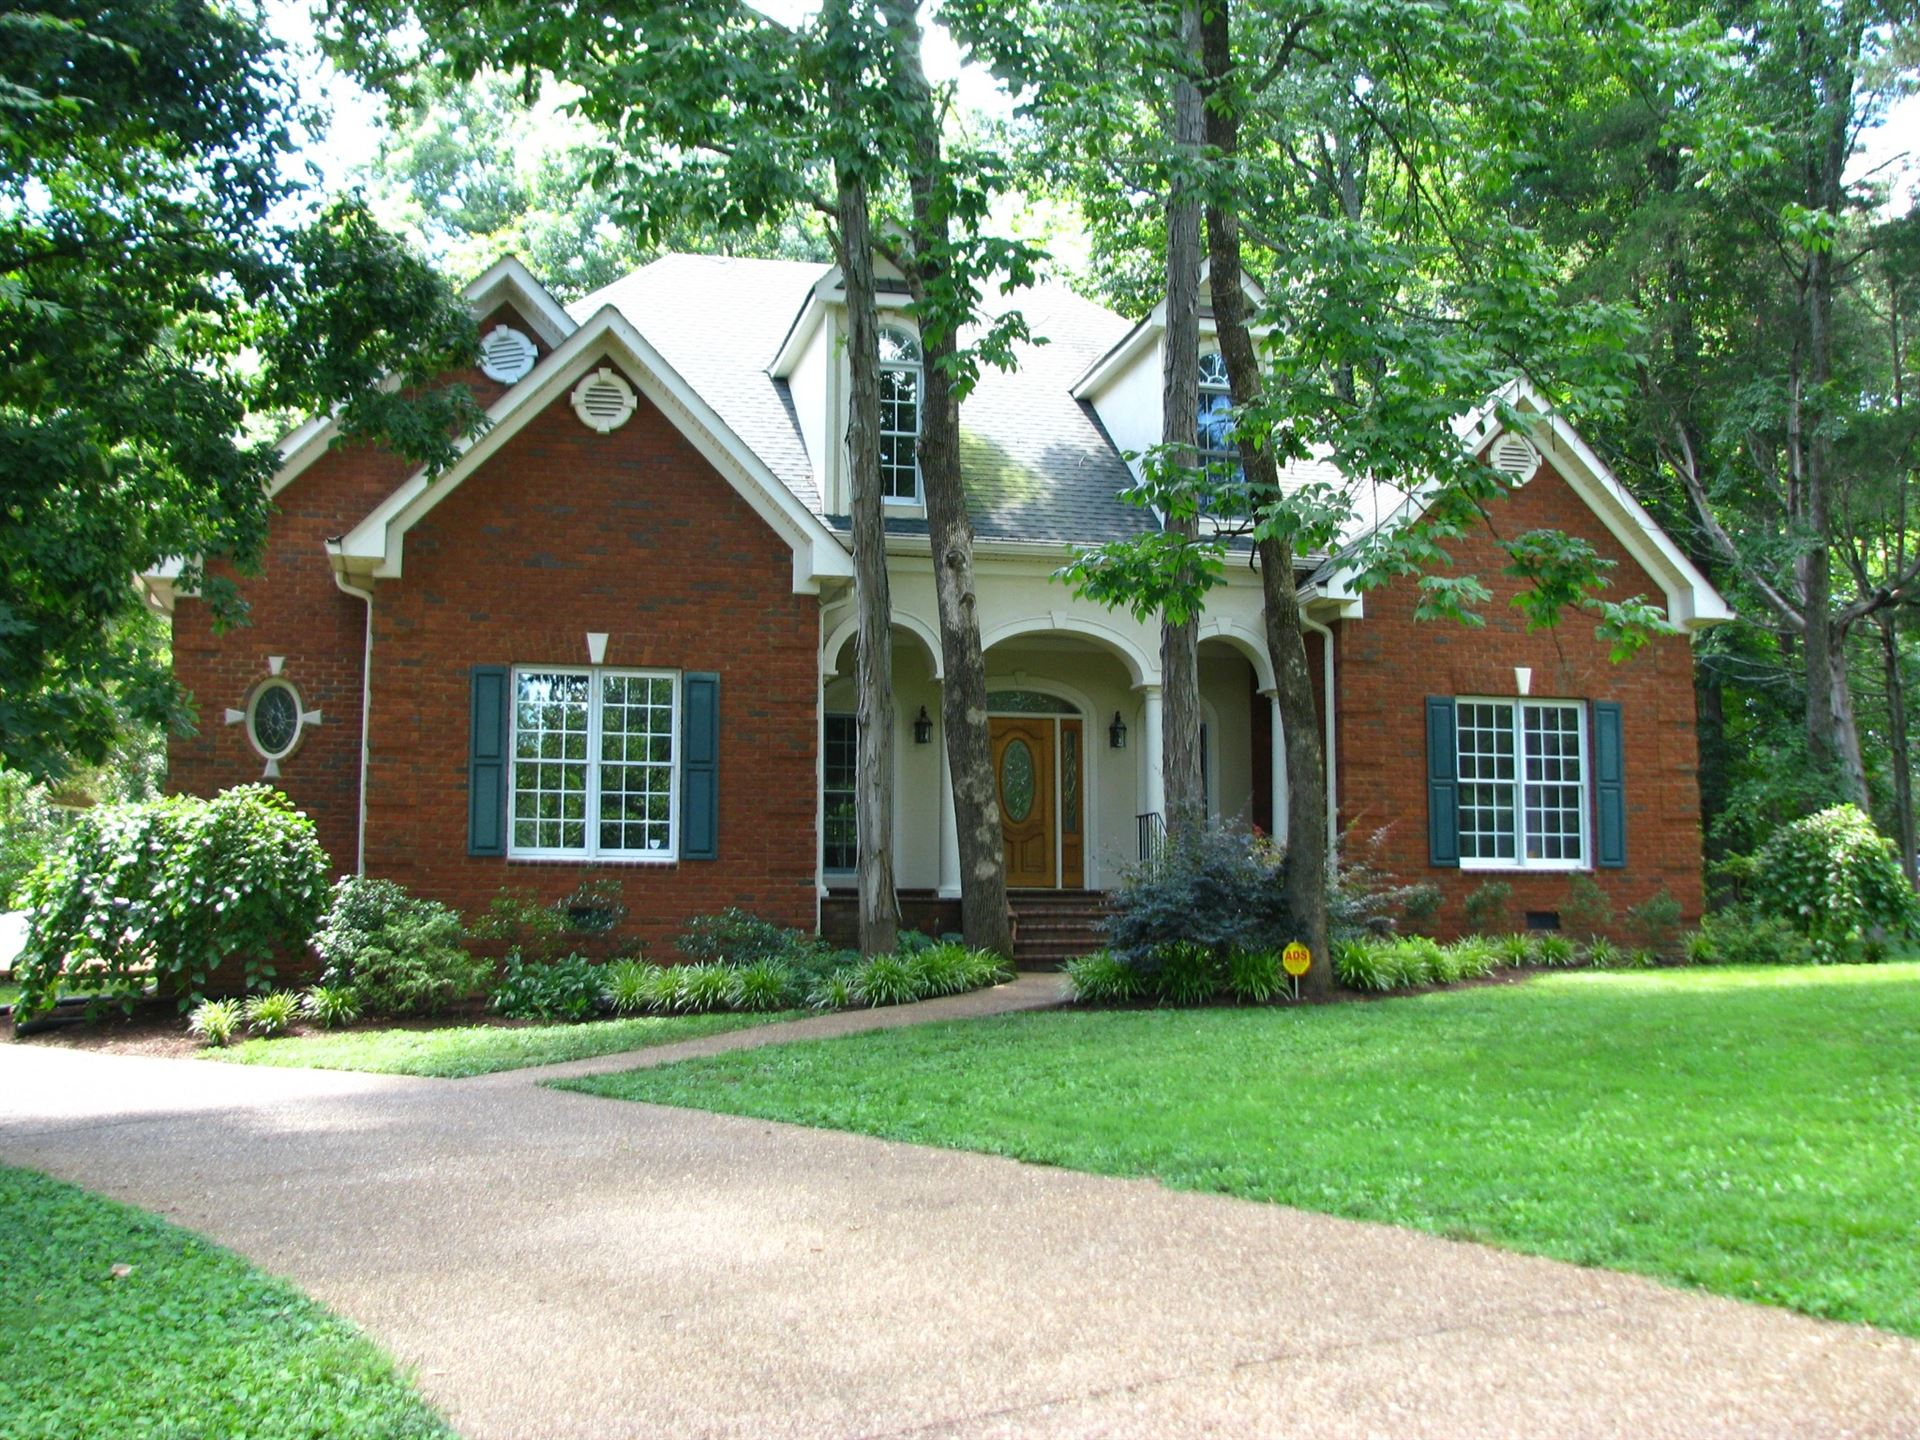 1430 Shagbark Trl, Murfreesboro, TN 37130 - MLS#: 2176453